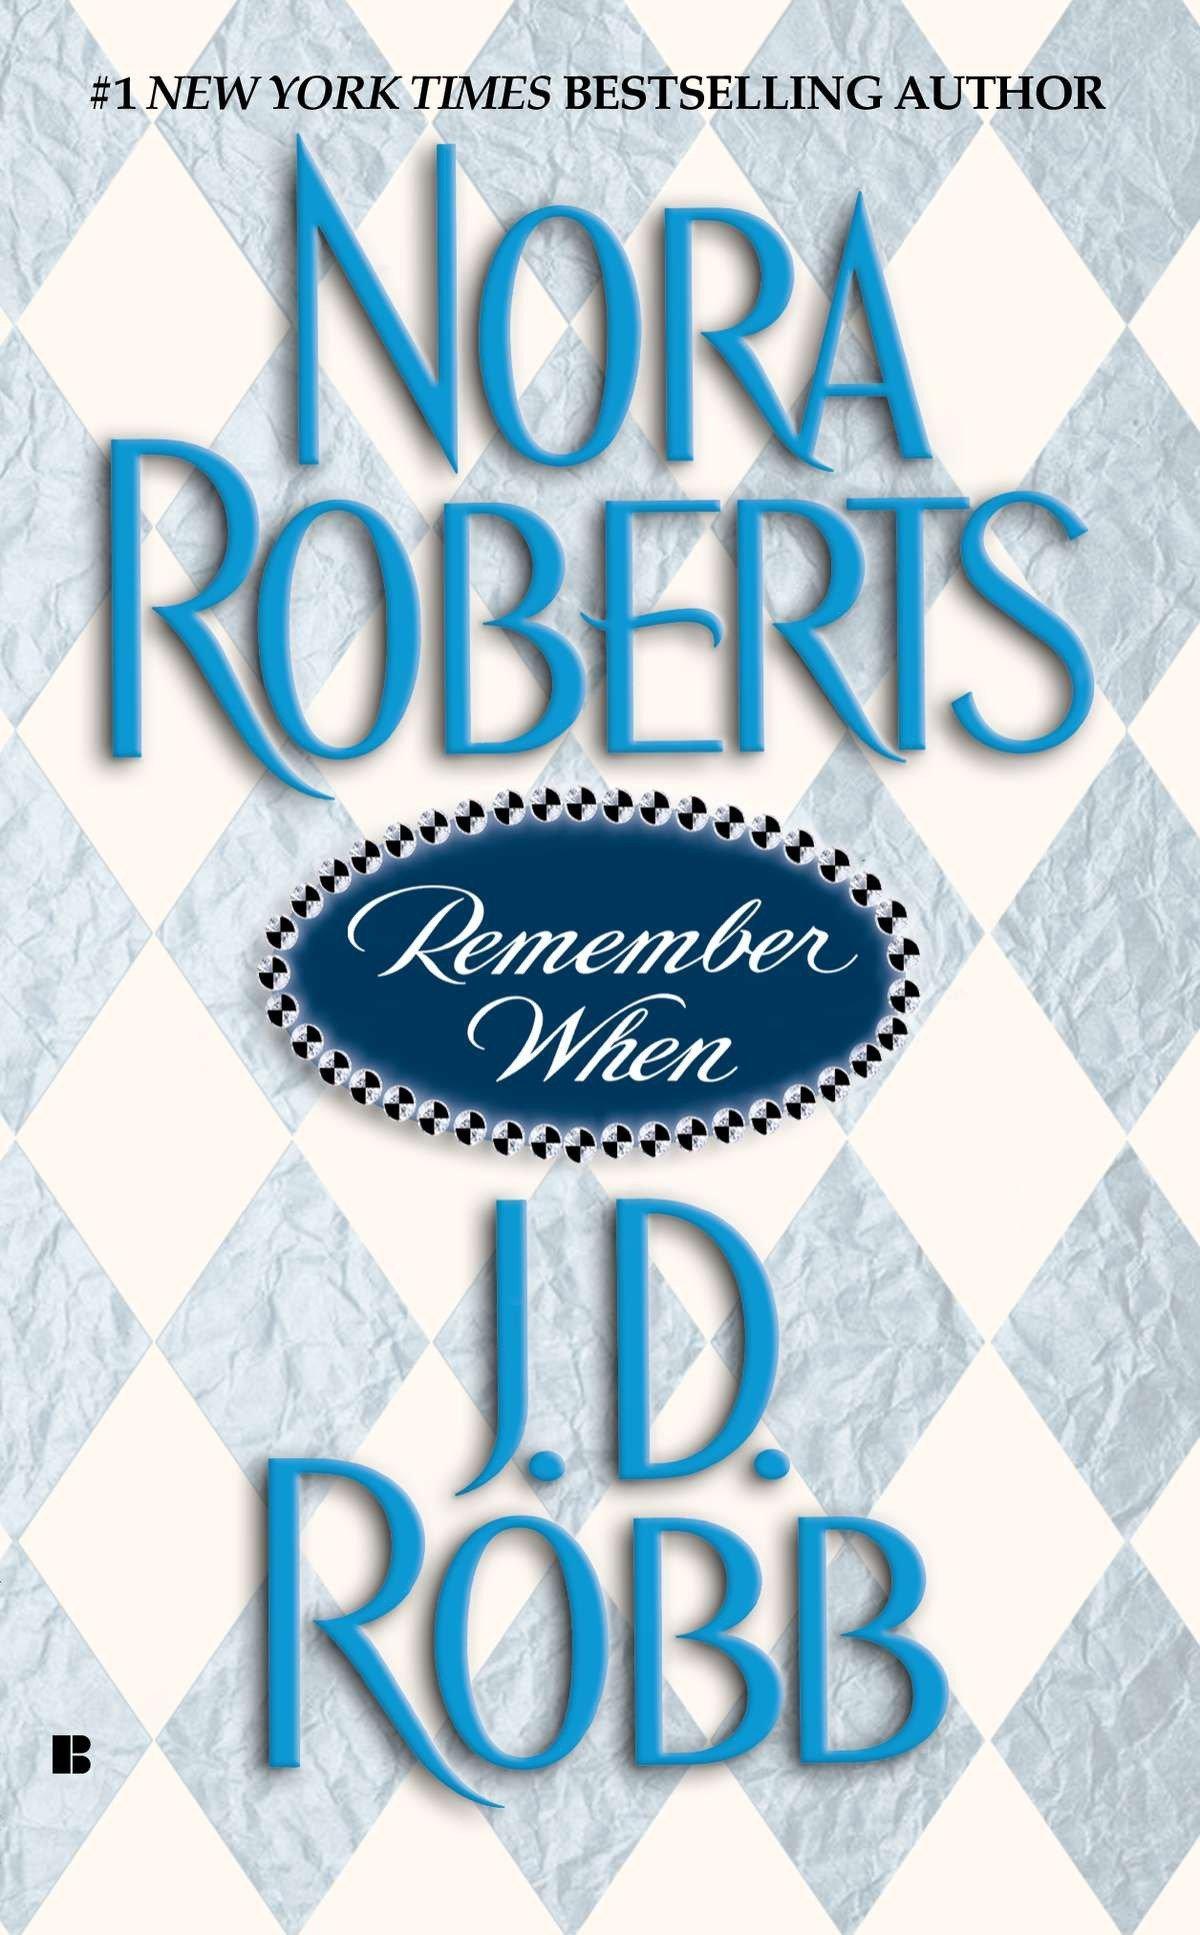 Remember When: Nora Roberts, J. D. Robb: 9780425195475: Amazon.com: Books